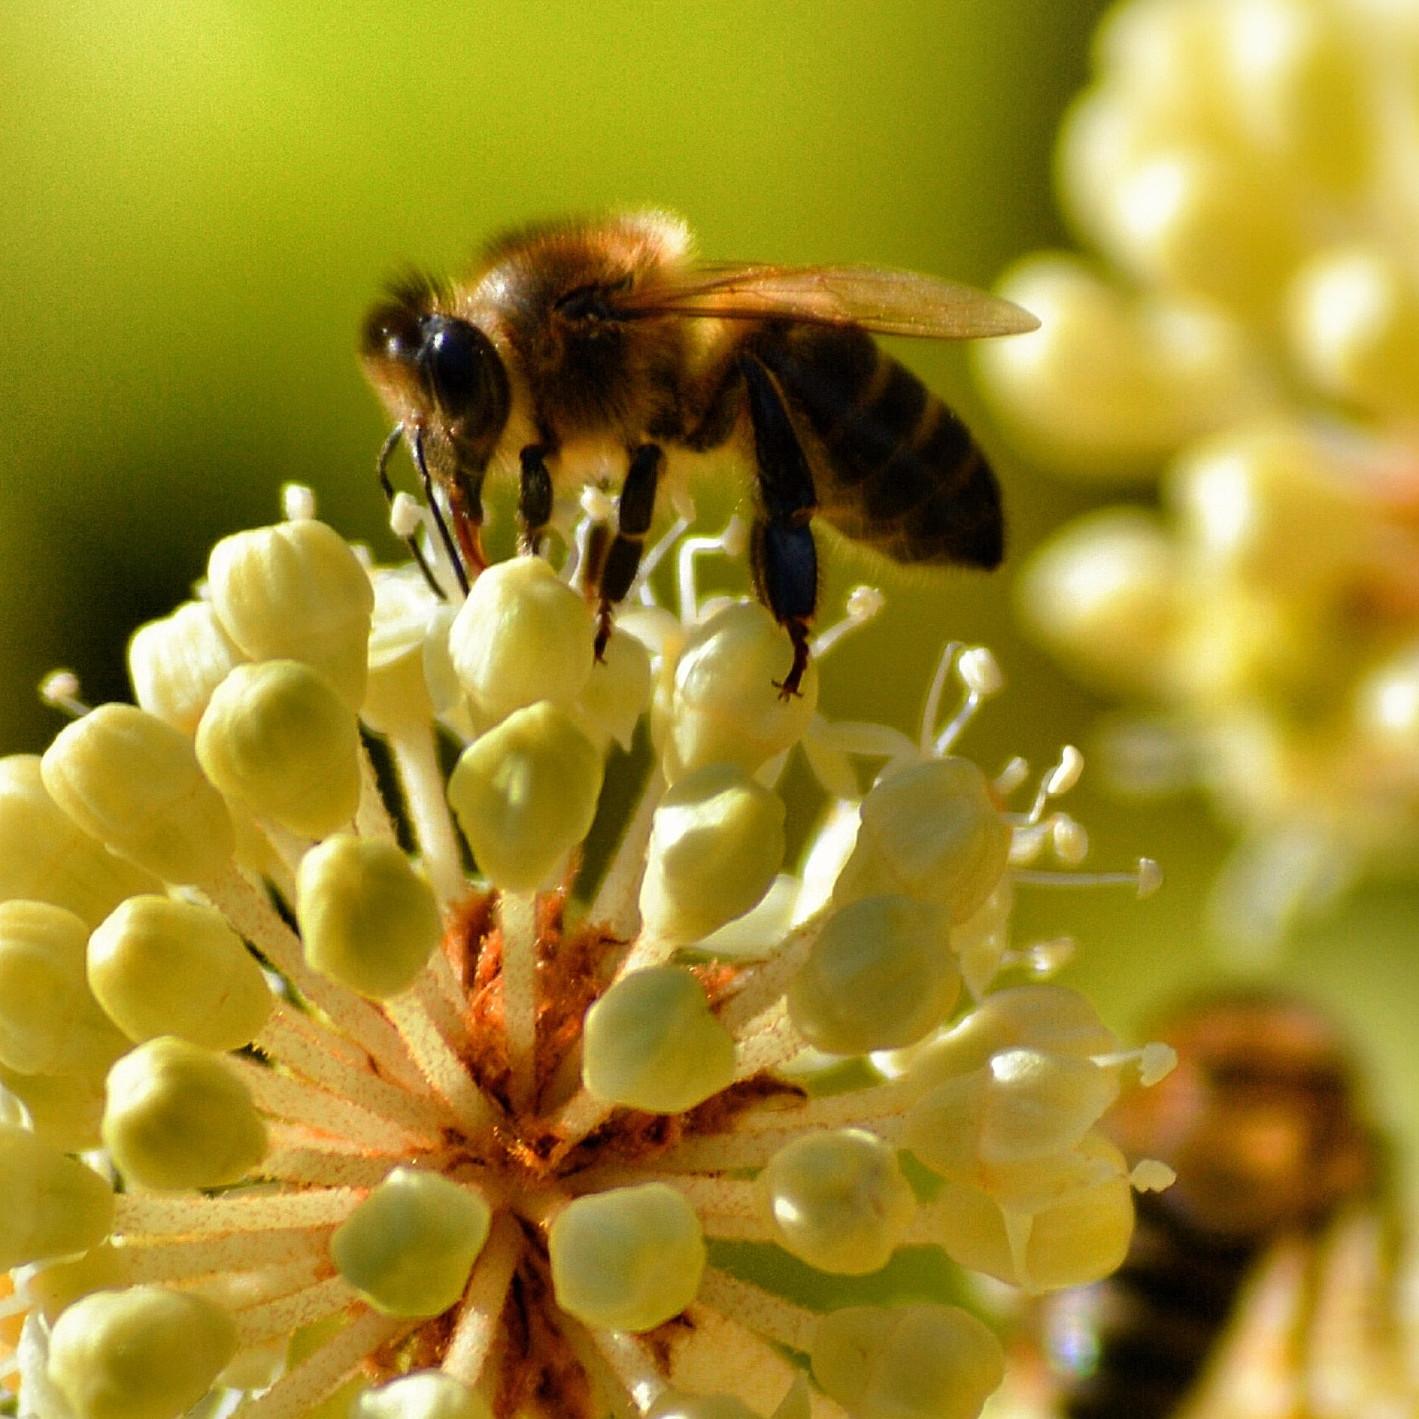 1-le-miel/images/bee2.jpg